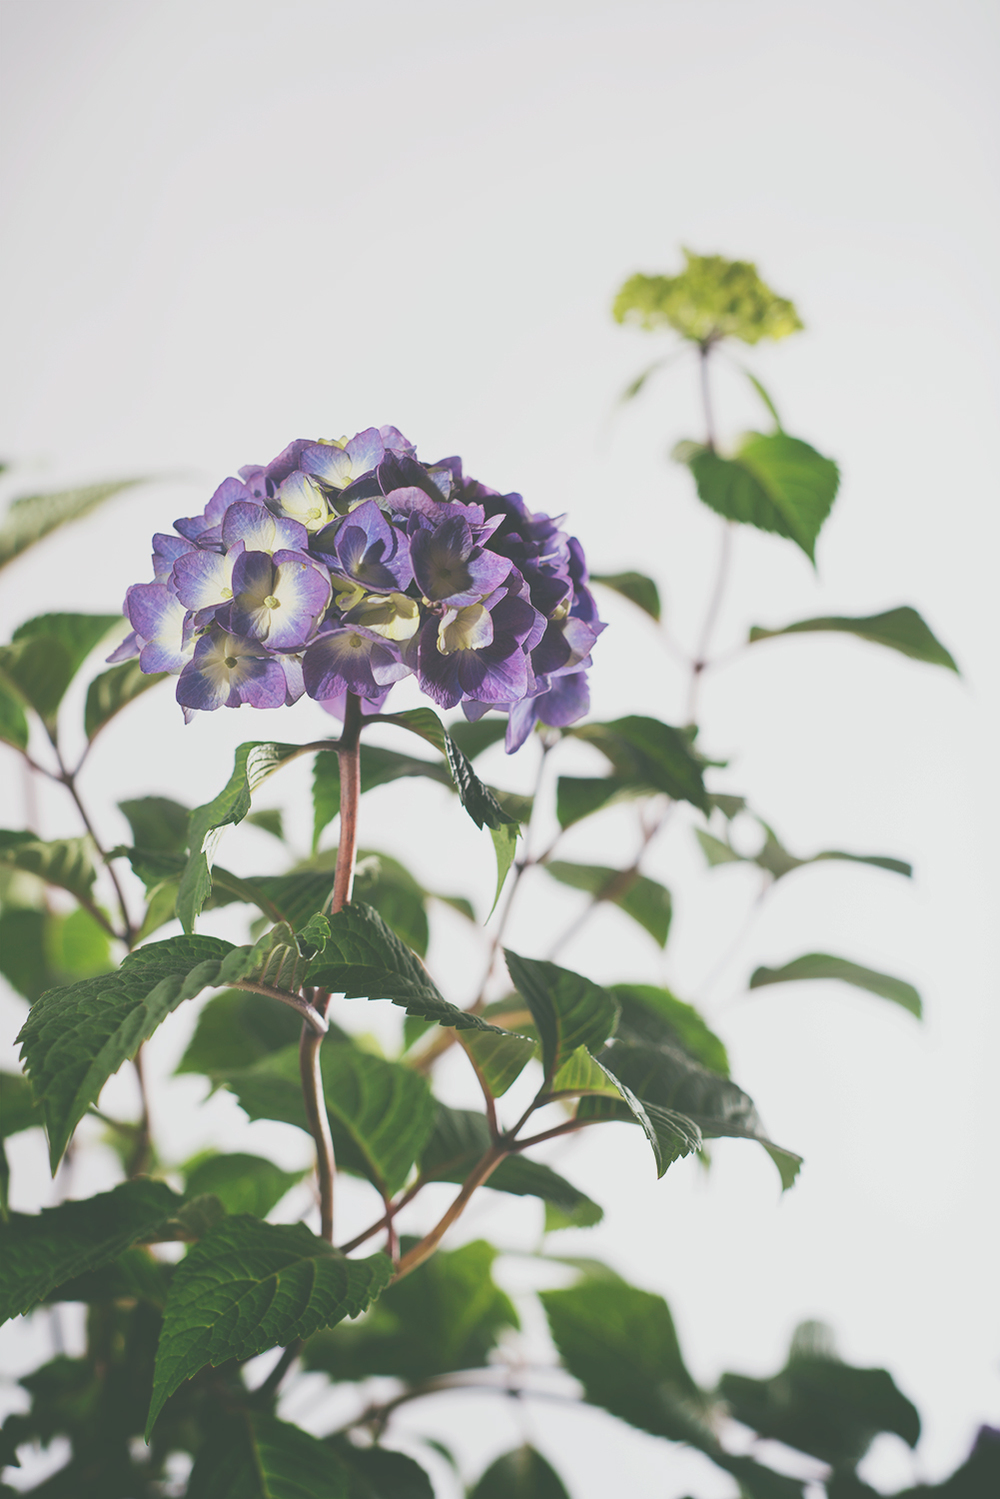 hydrangea8.jpg